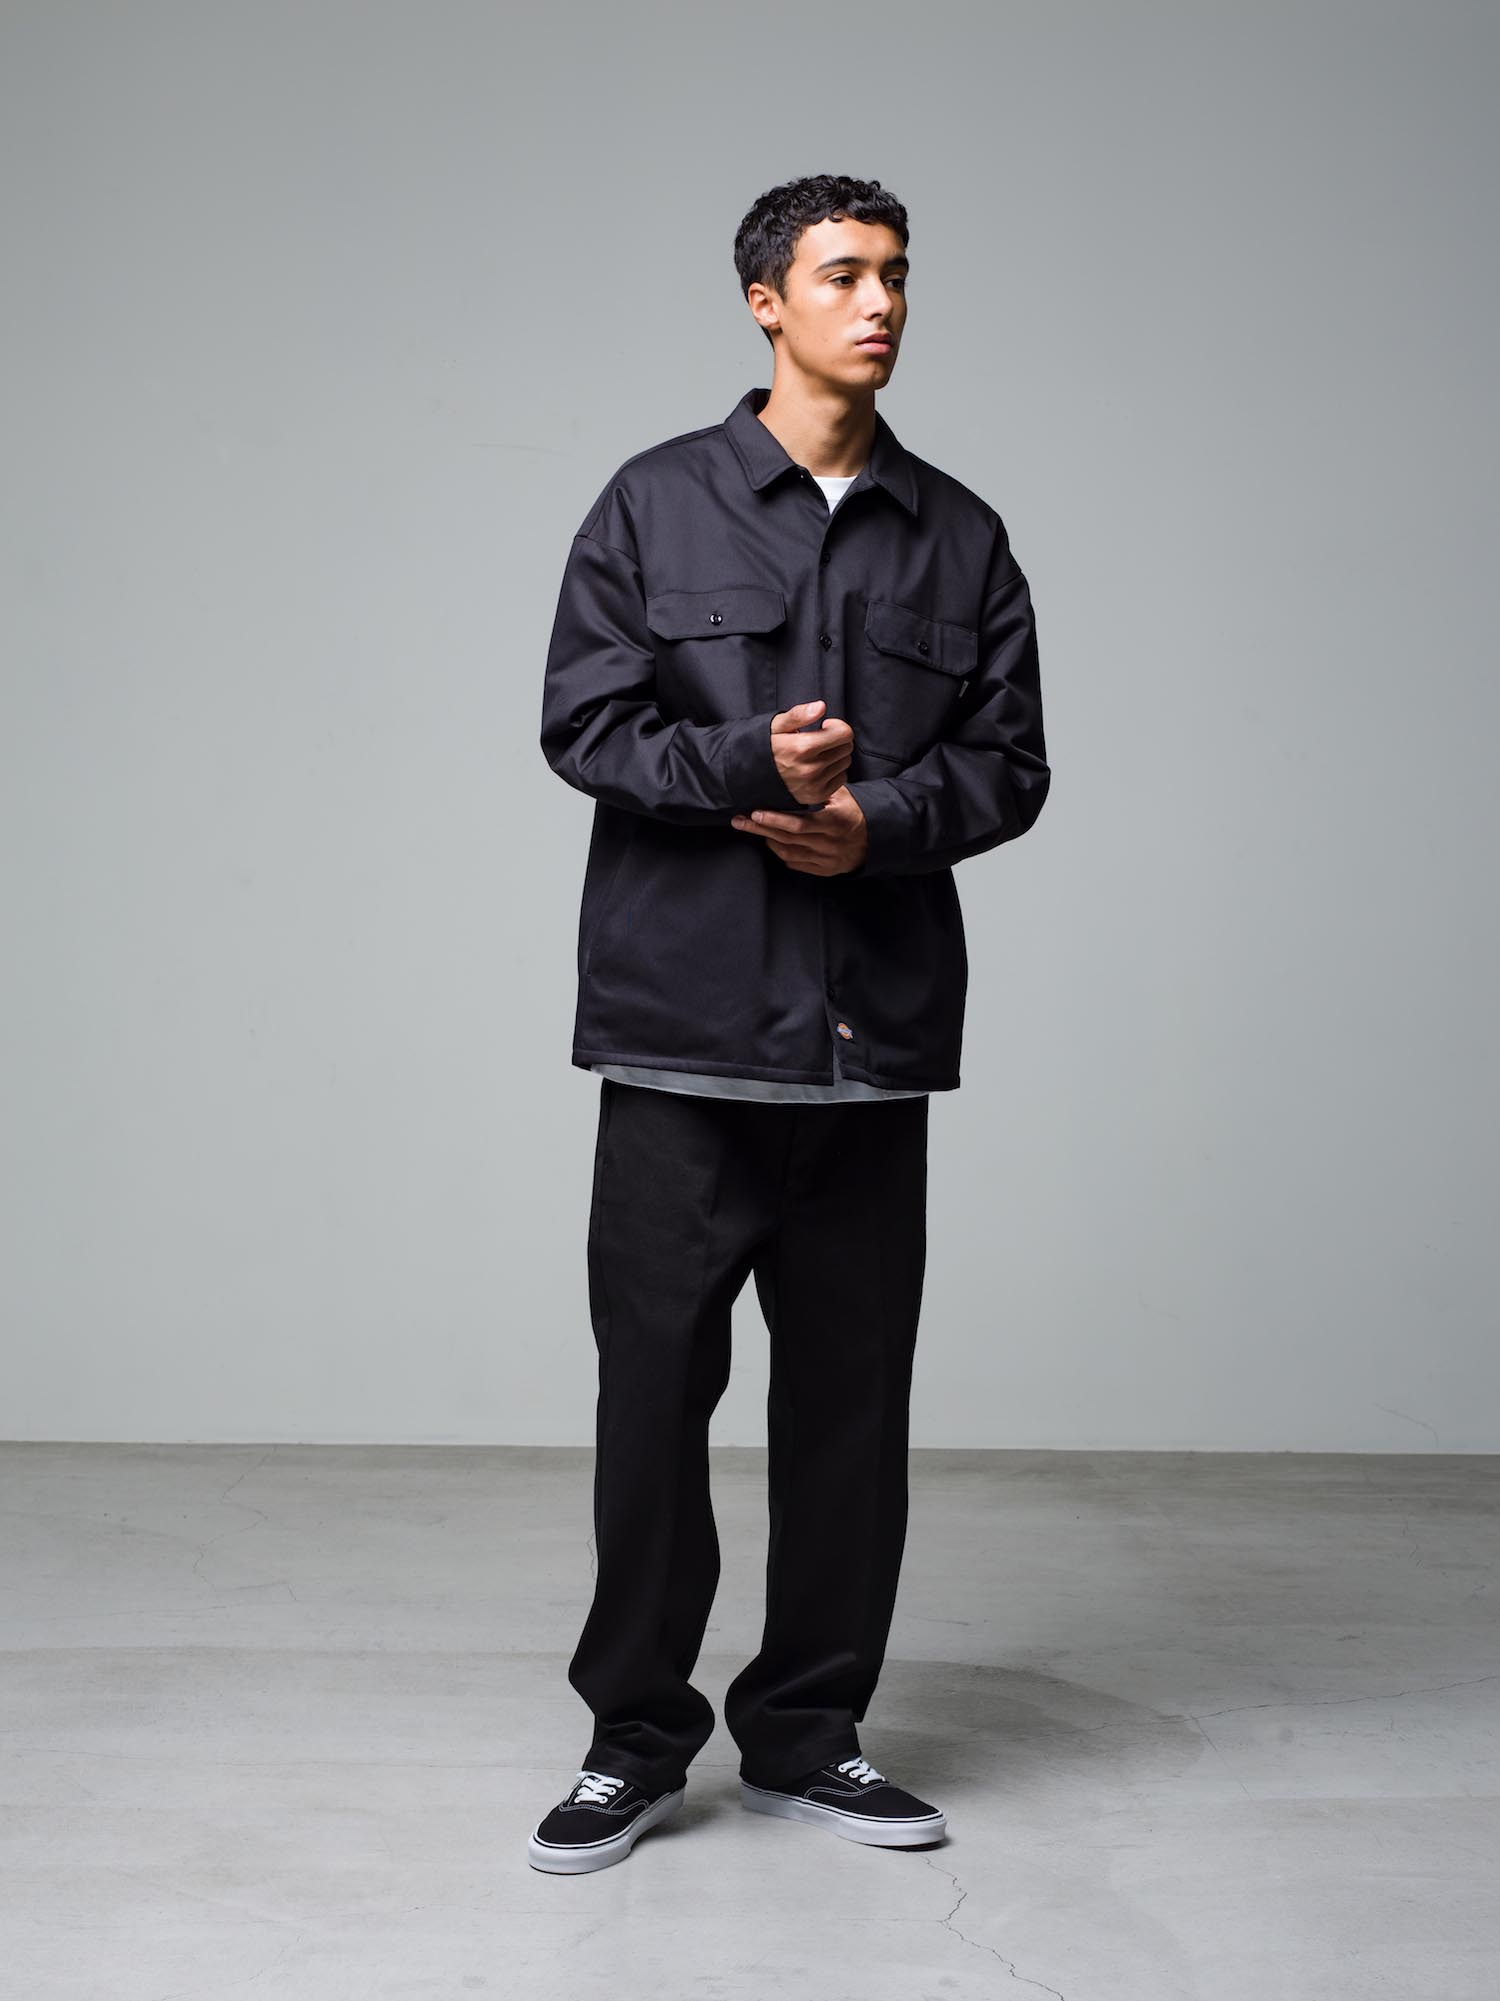 7) Jacket ¥23,100  Inner ¥8,800  Pants ¥22,000  Shoes ¥6,050